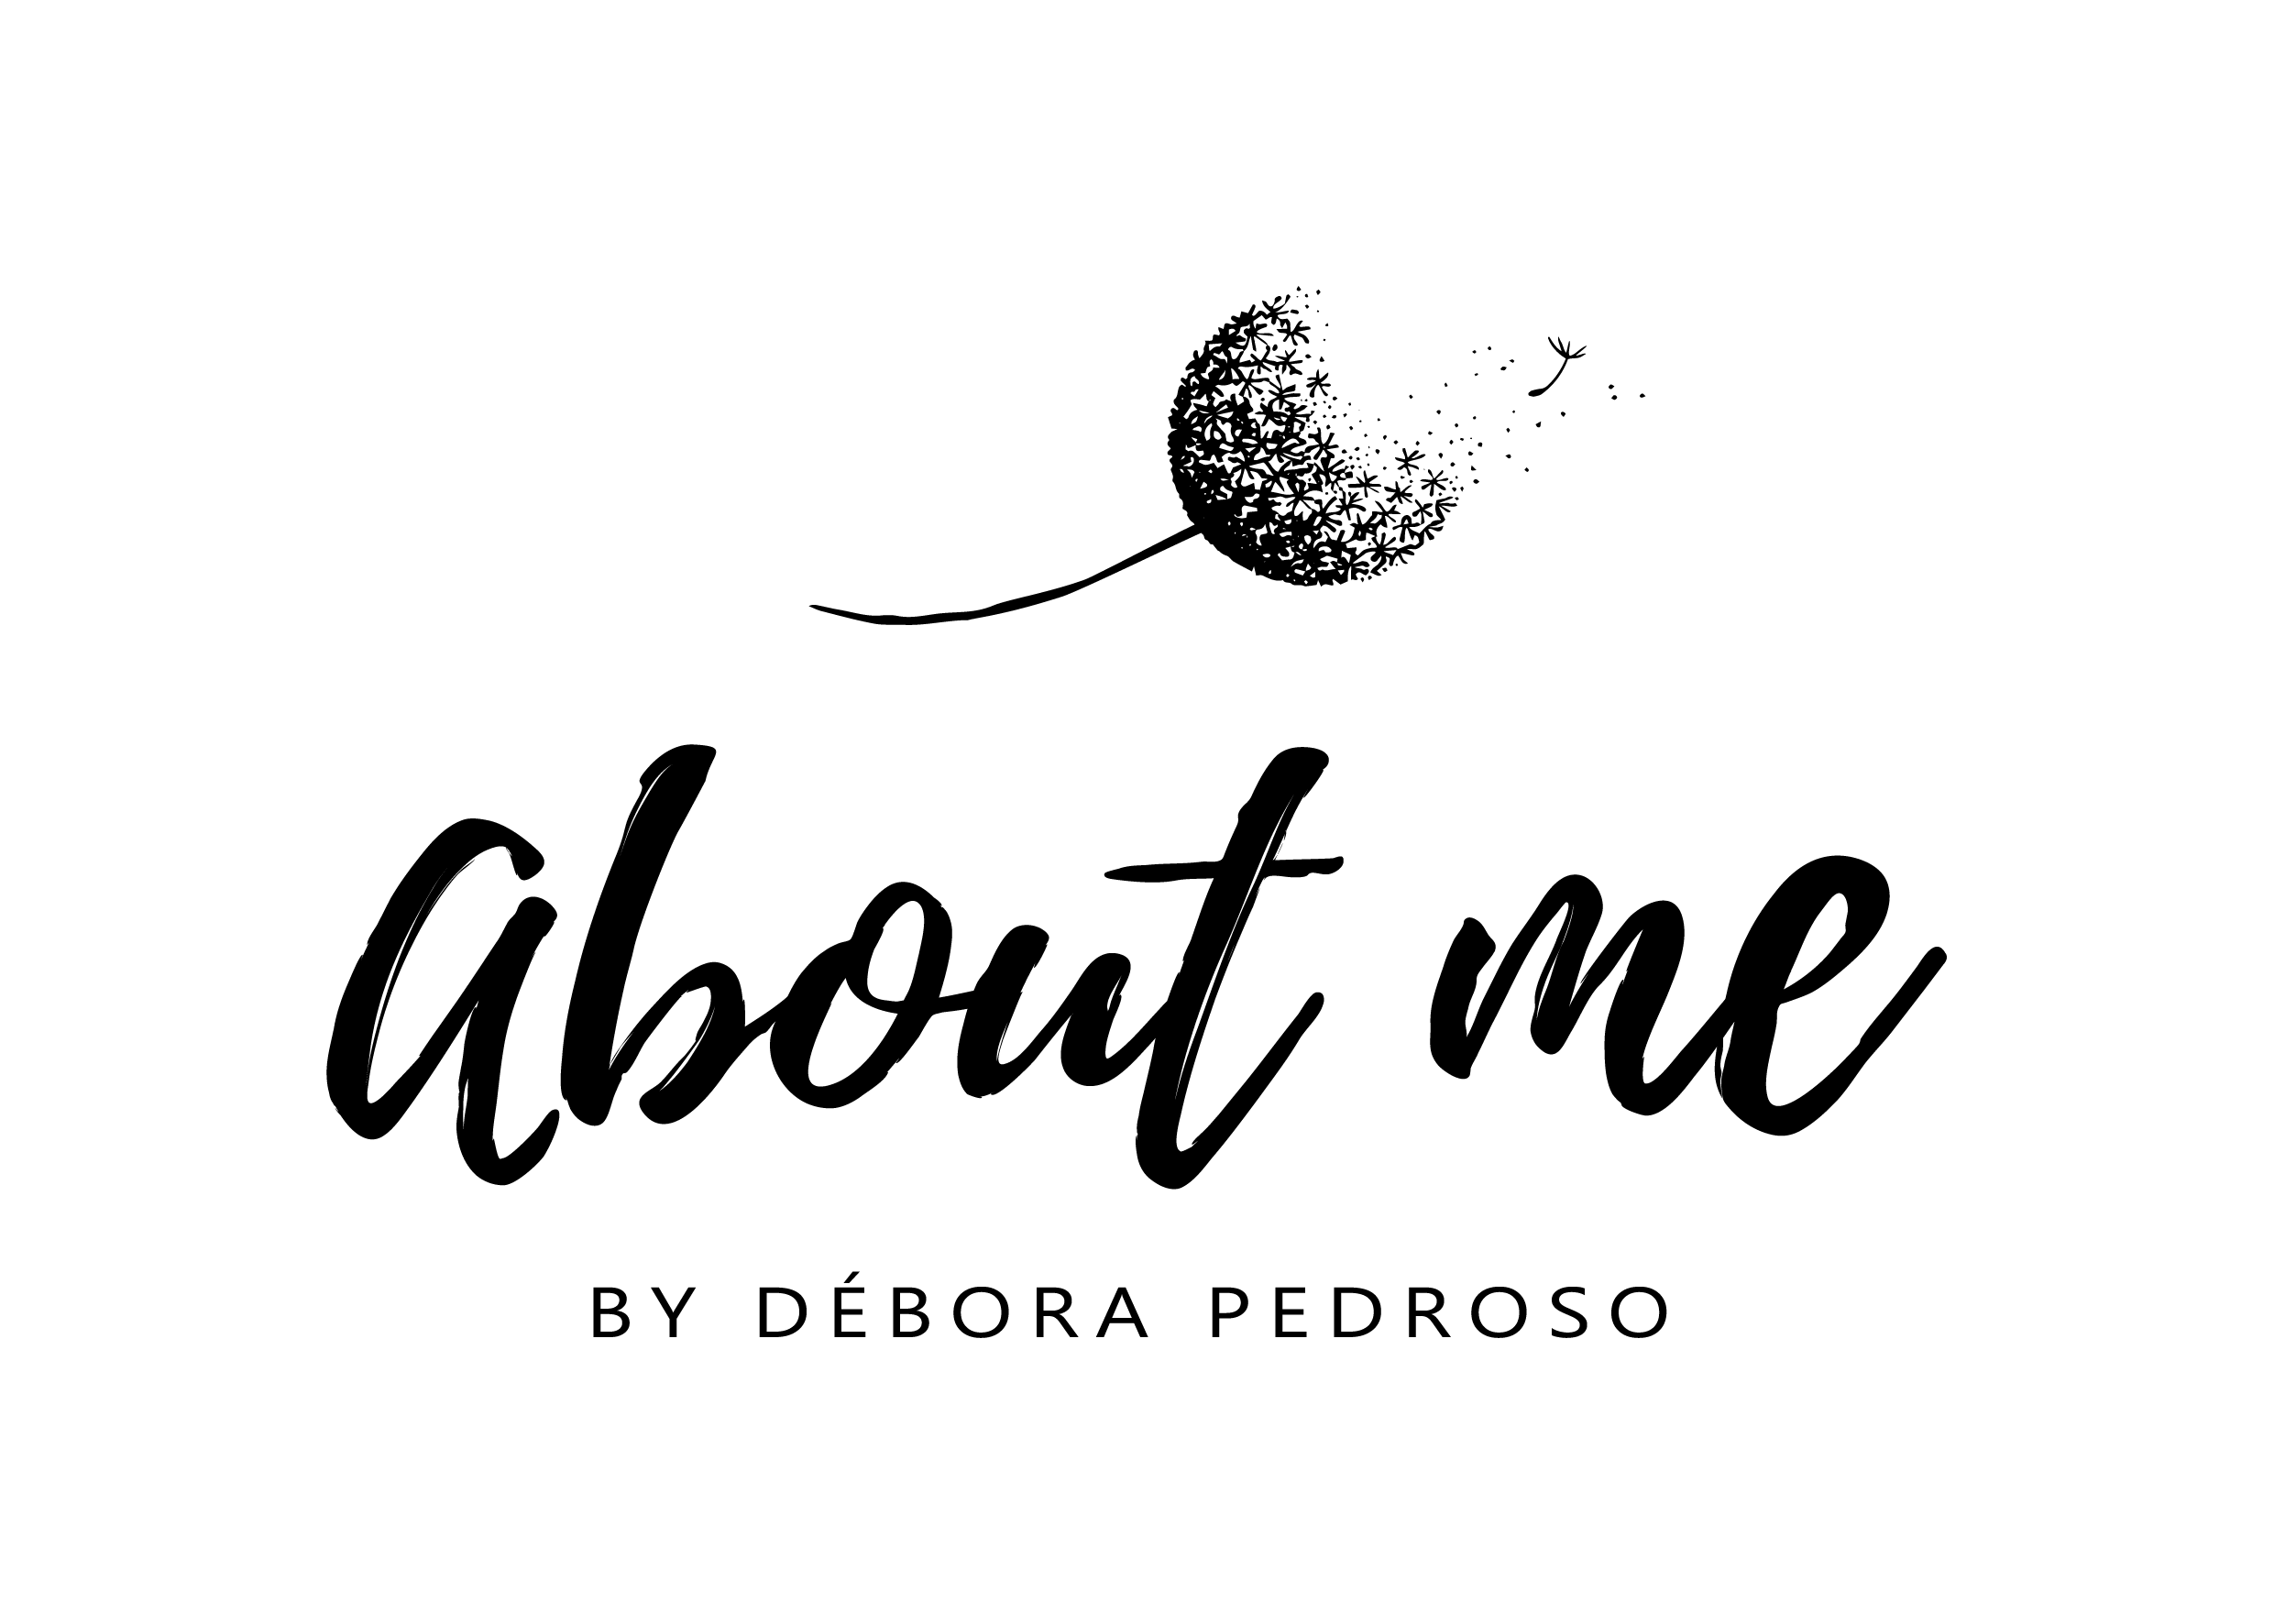 Logotipo ABOUT ME